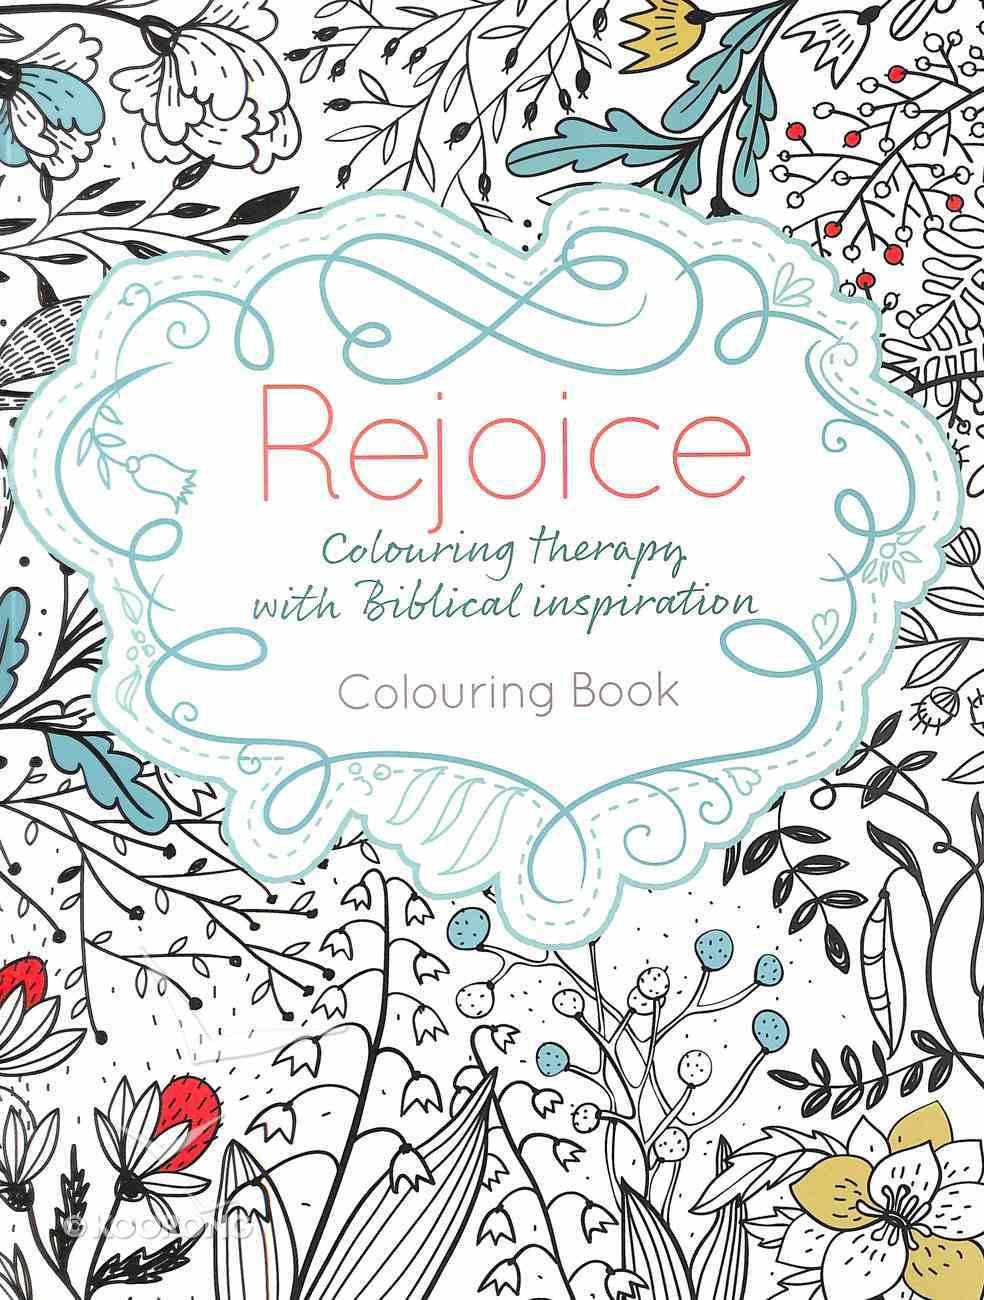 Rejoice (Adult Coloring Books Series) Paperback